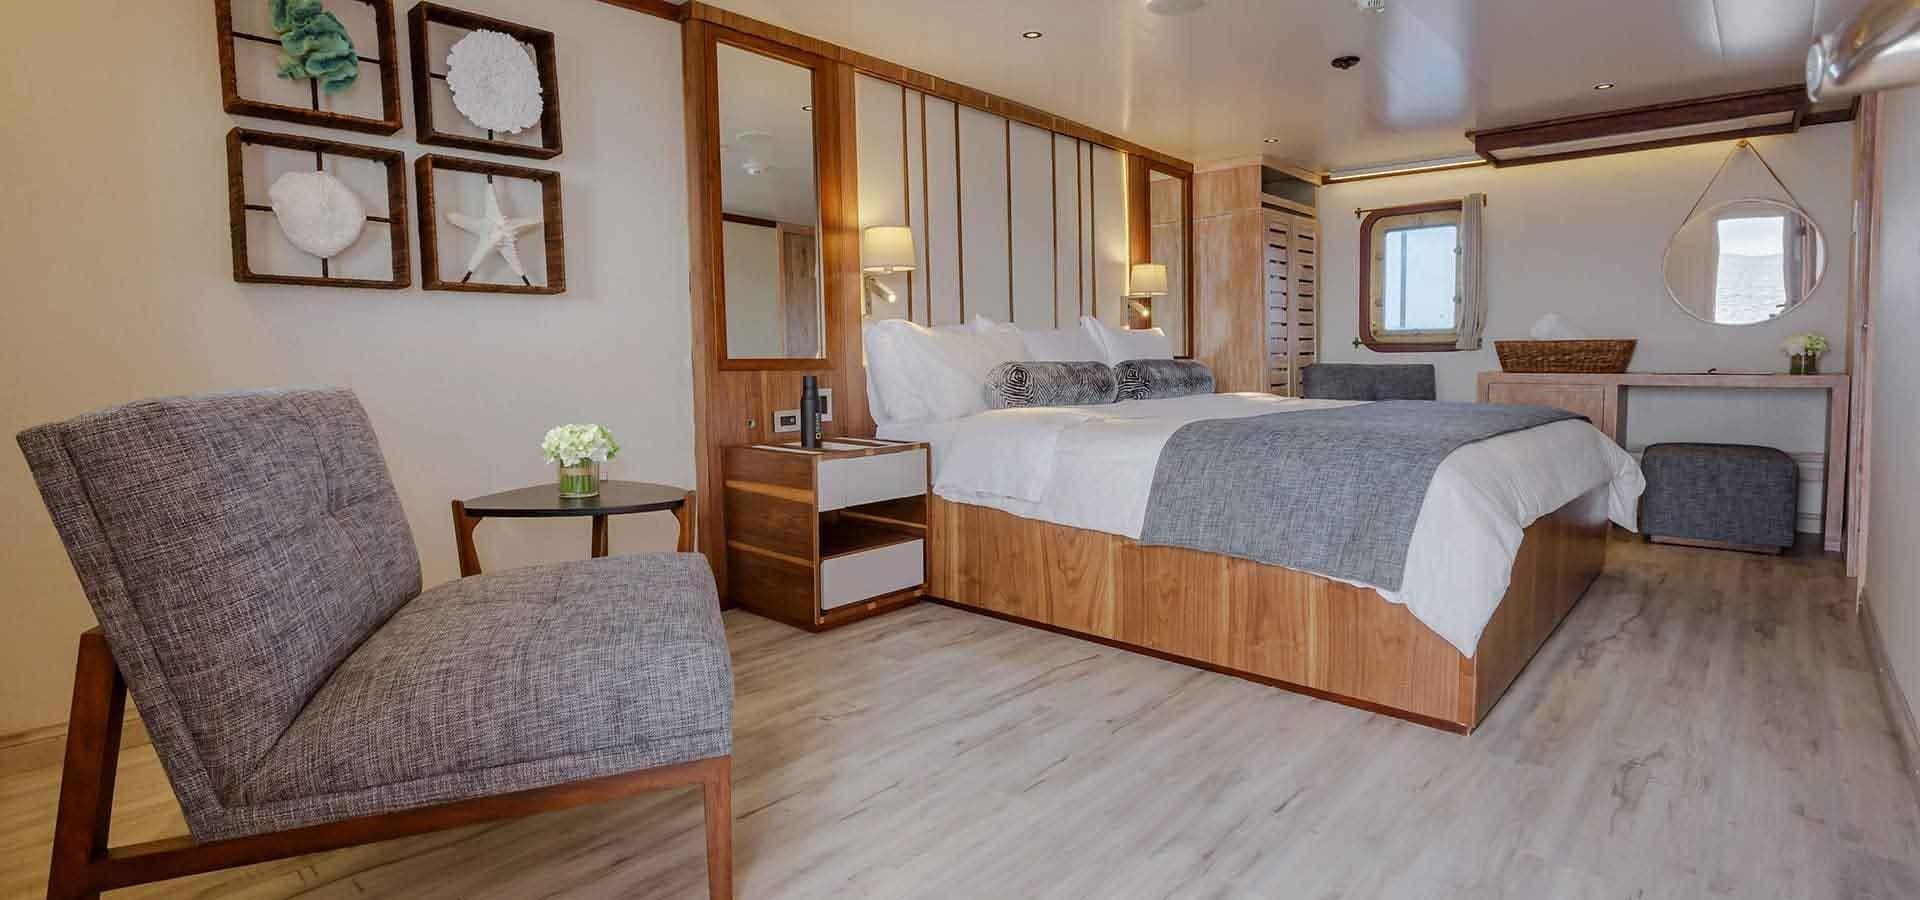 Bedroom evolution